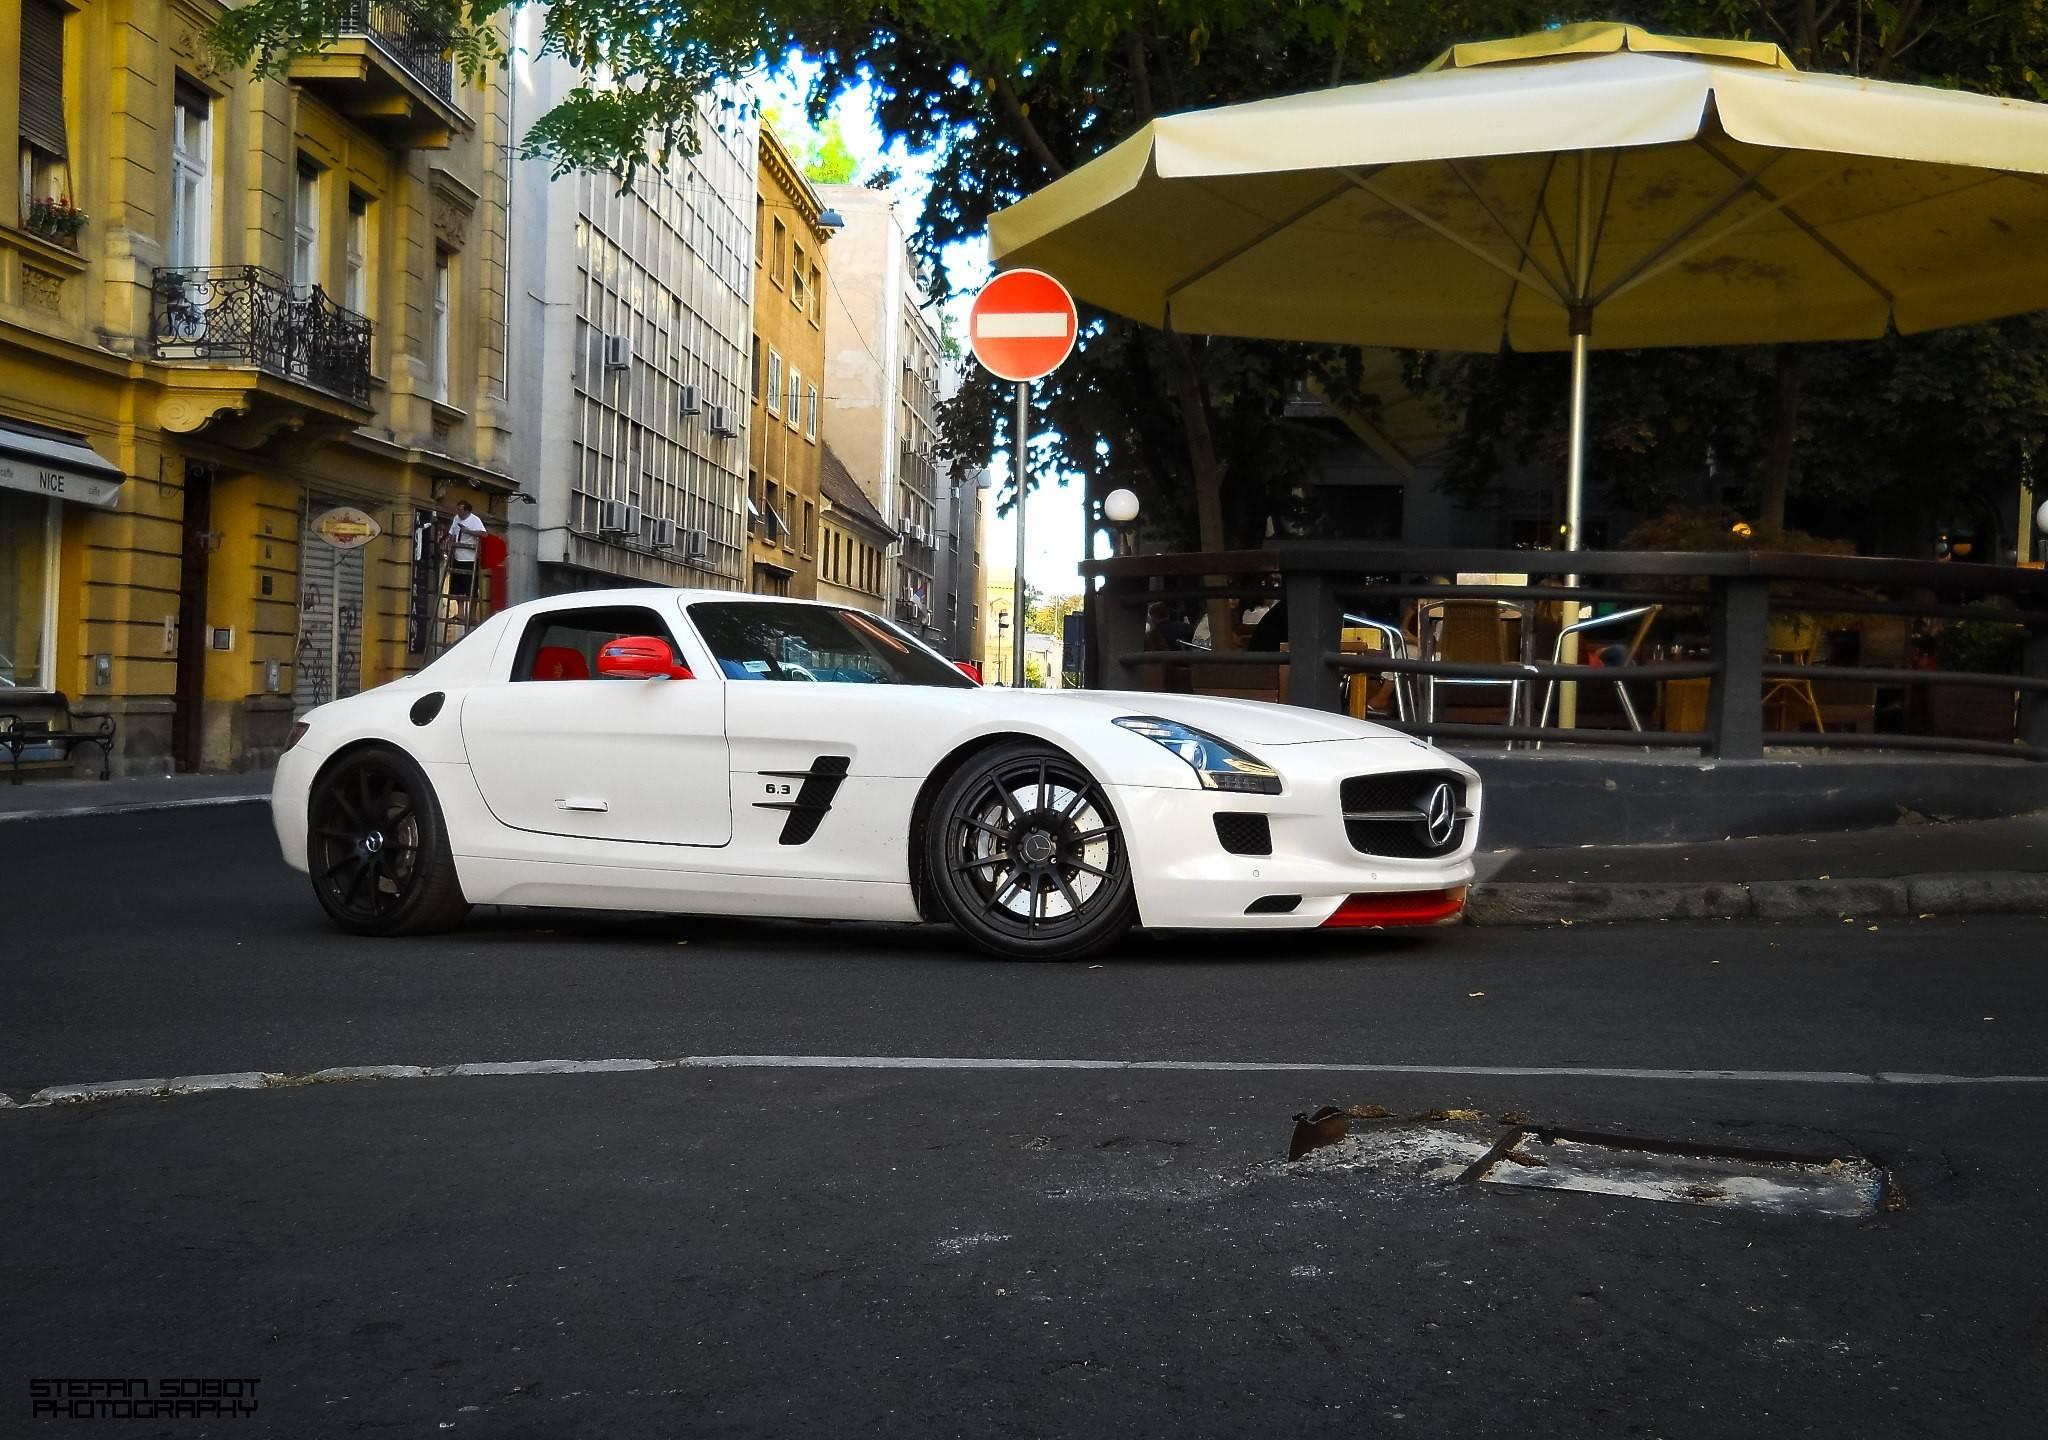 Cars 20481440 Wallpaper 2307893 2048x1440